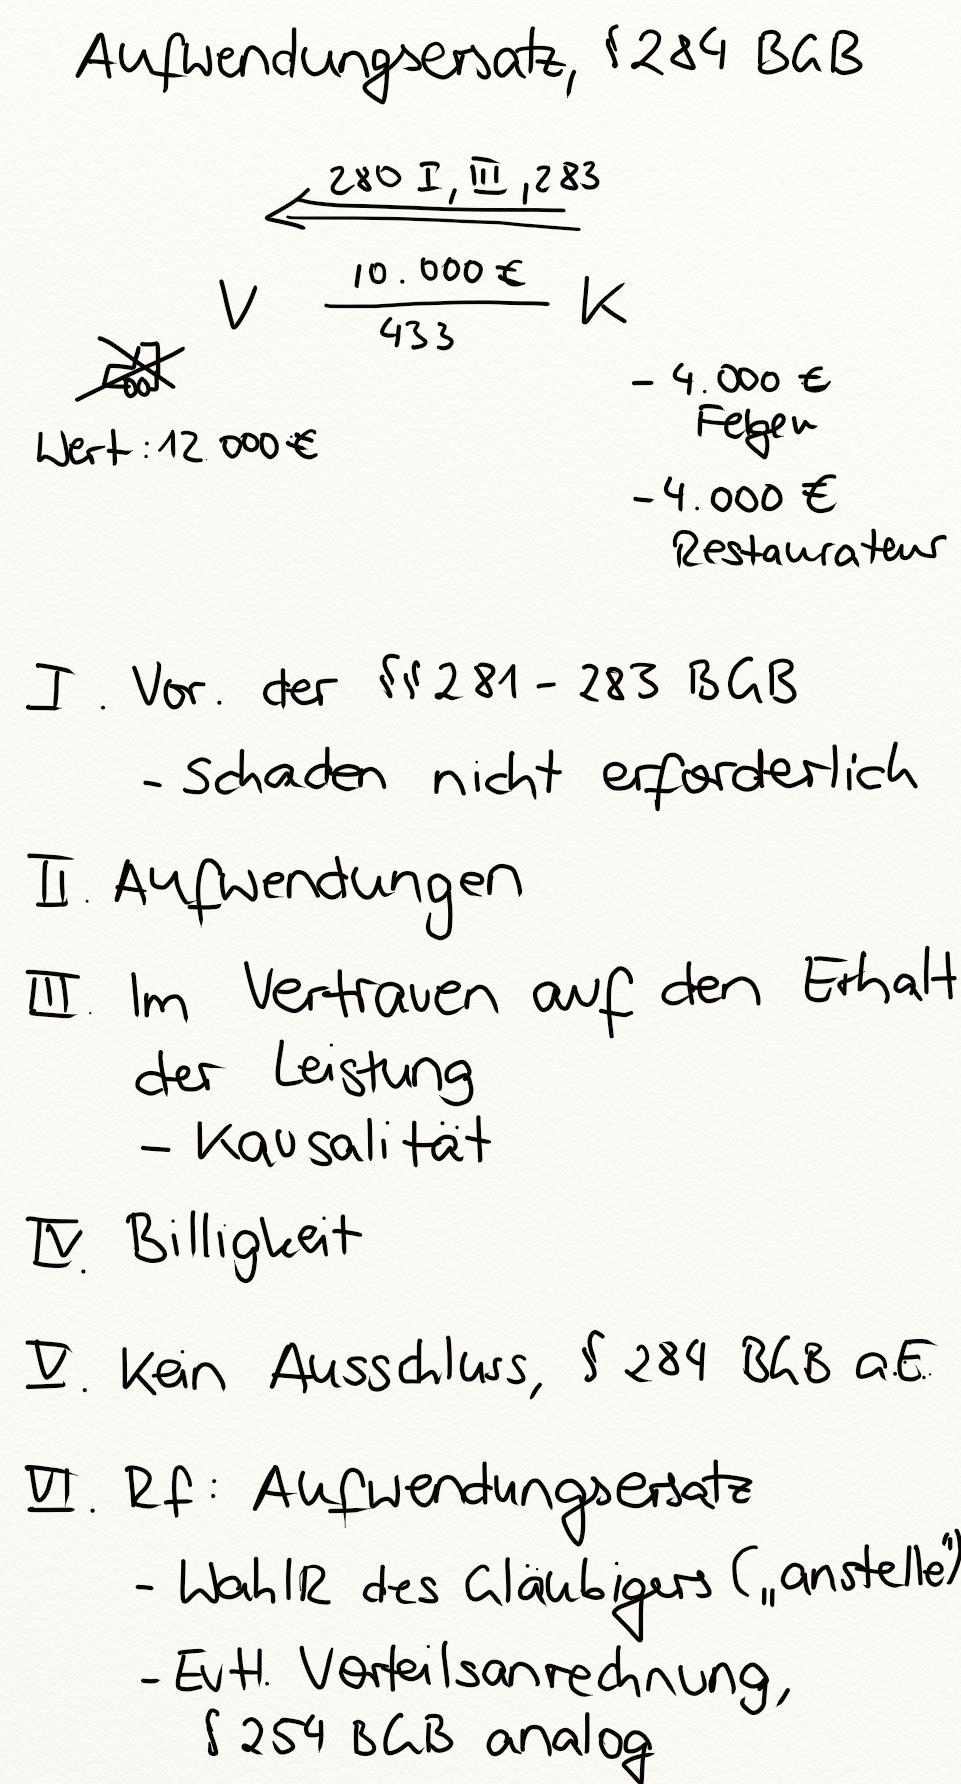 Aufwendungsersatz 284 Bgb Exkurs Jura Online